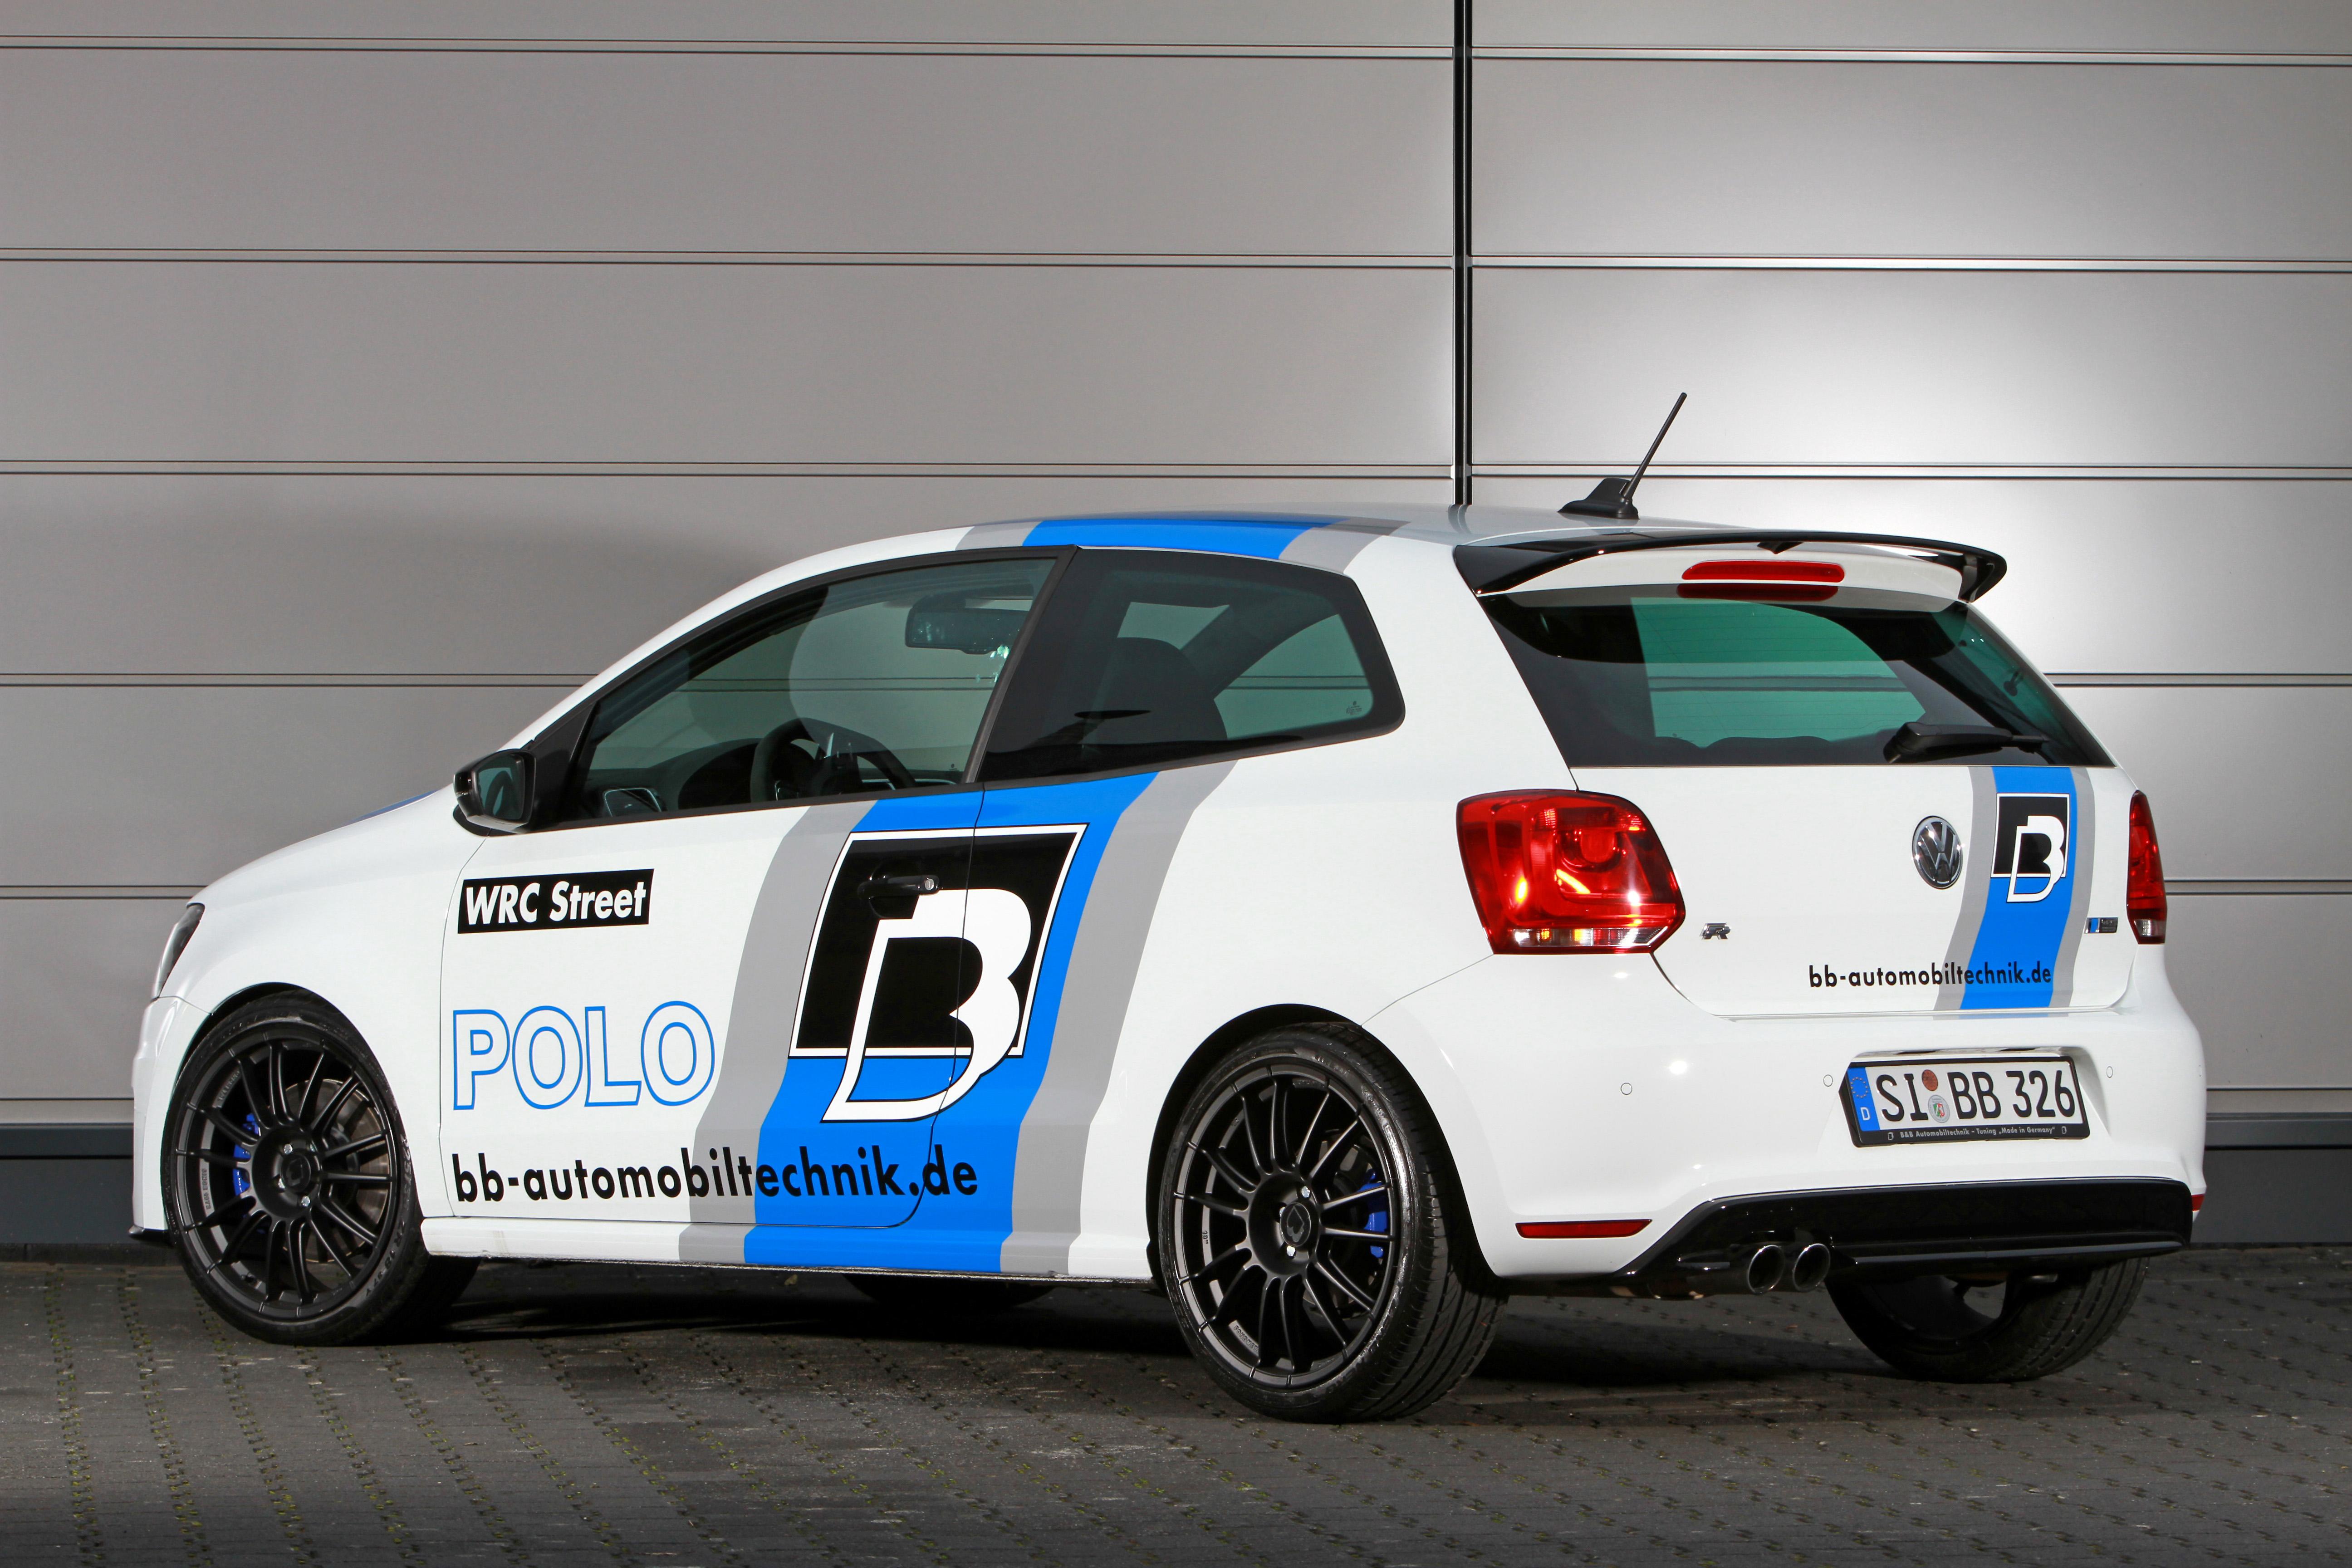 VW_Polo_R_WRC_Street_Tuning_B&B_Automobiltechnik_2